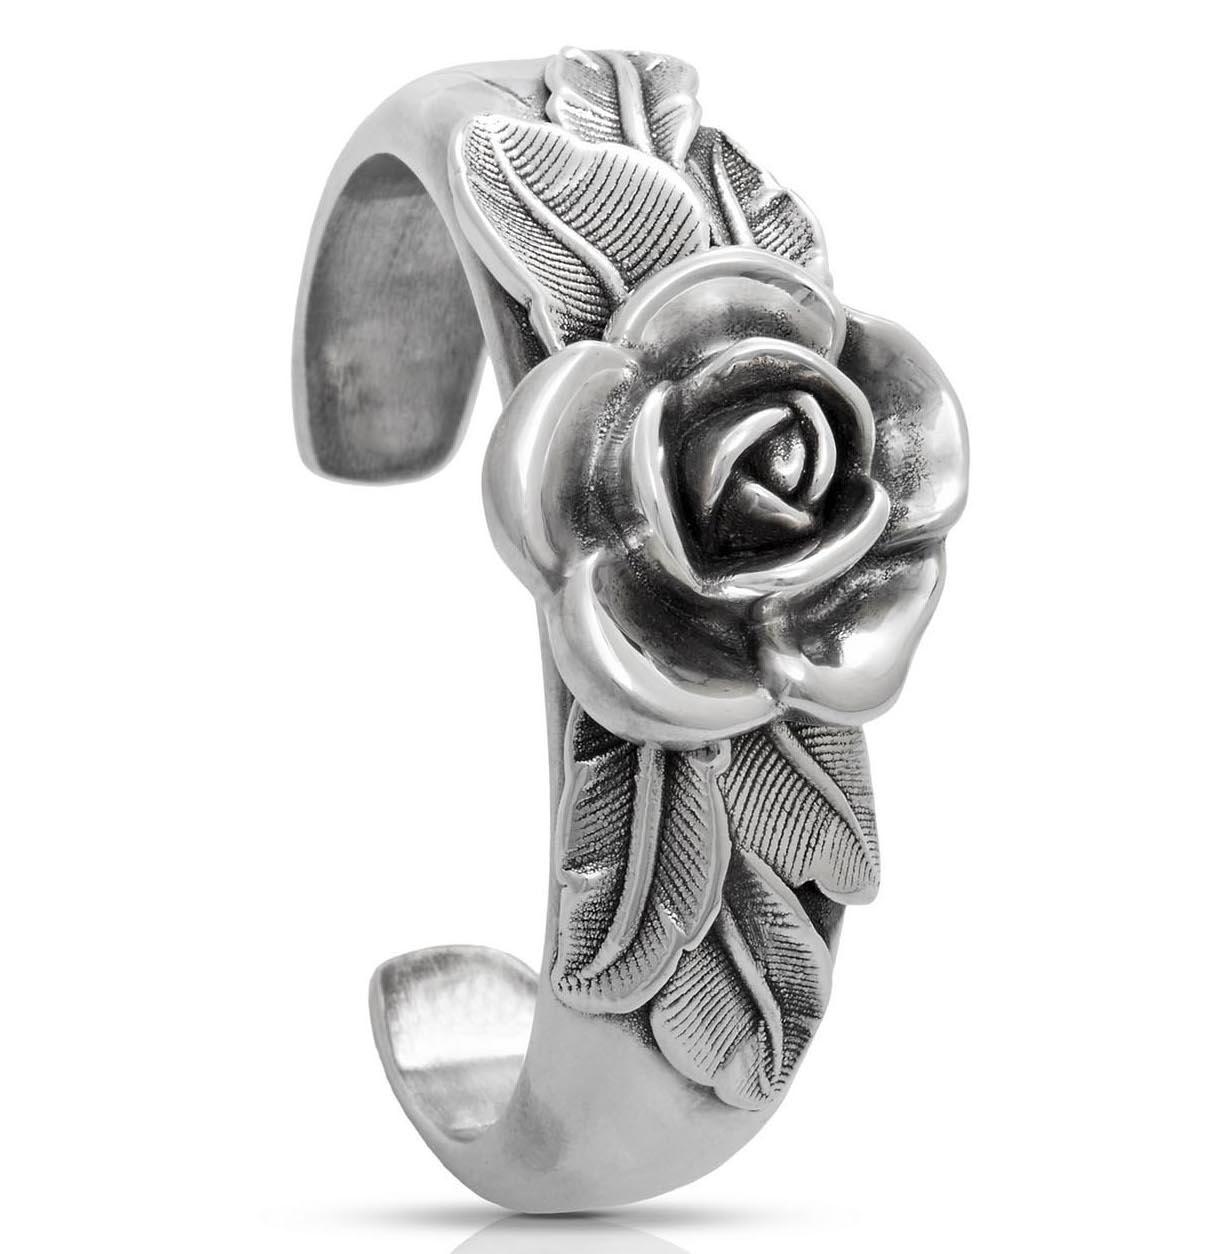 Paz Creations rose cuff bracelet